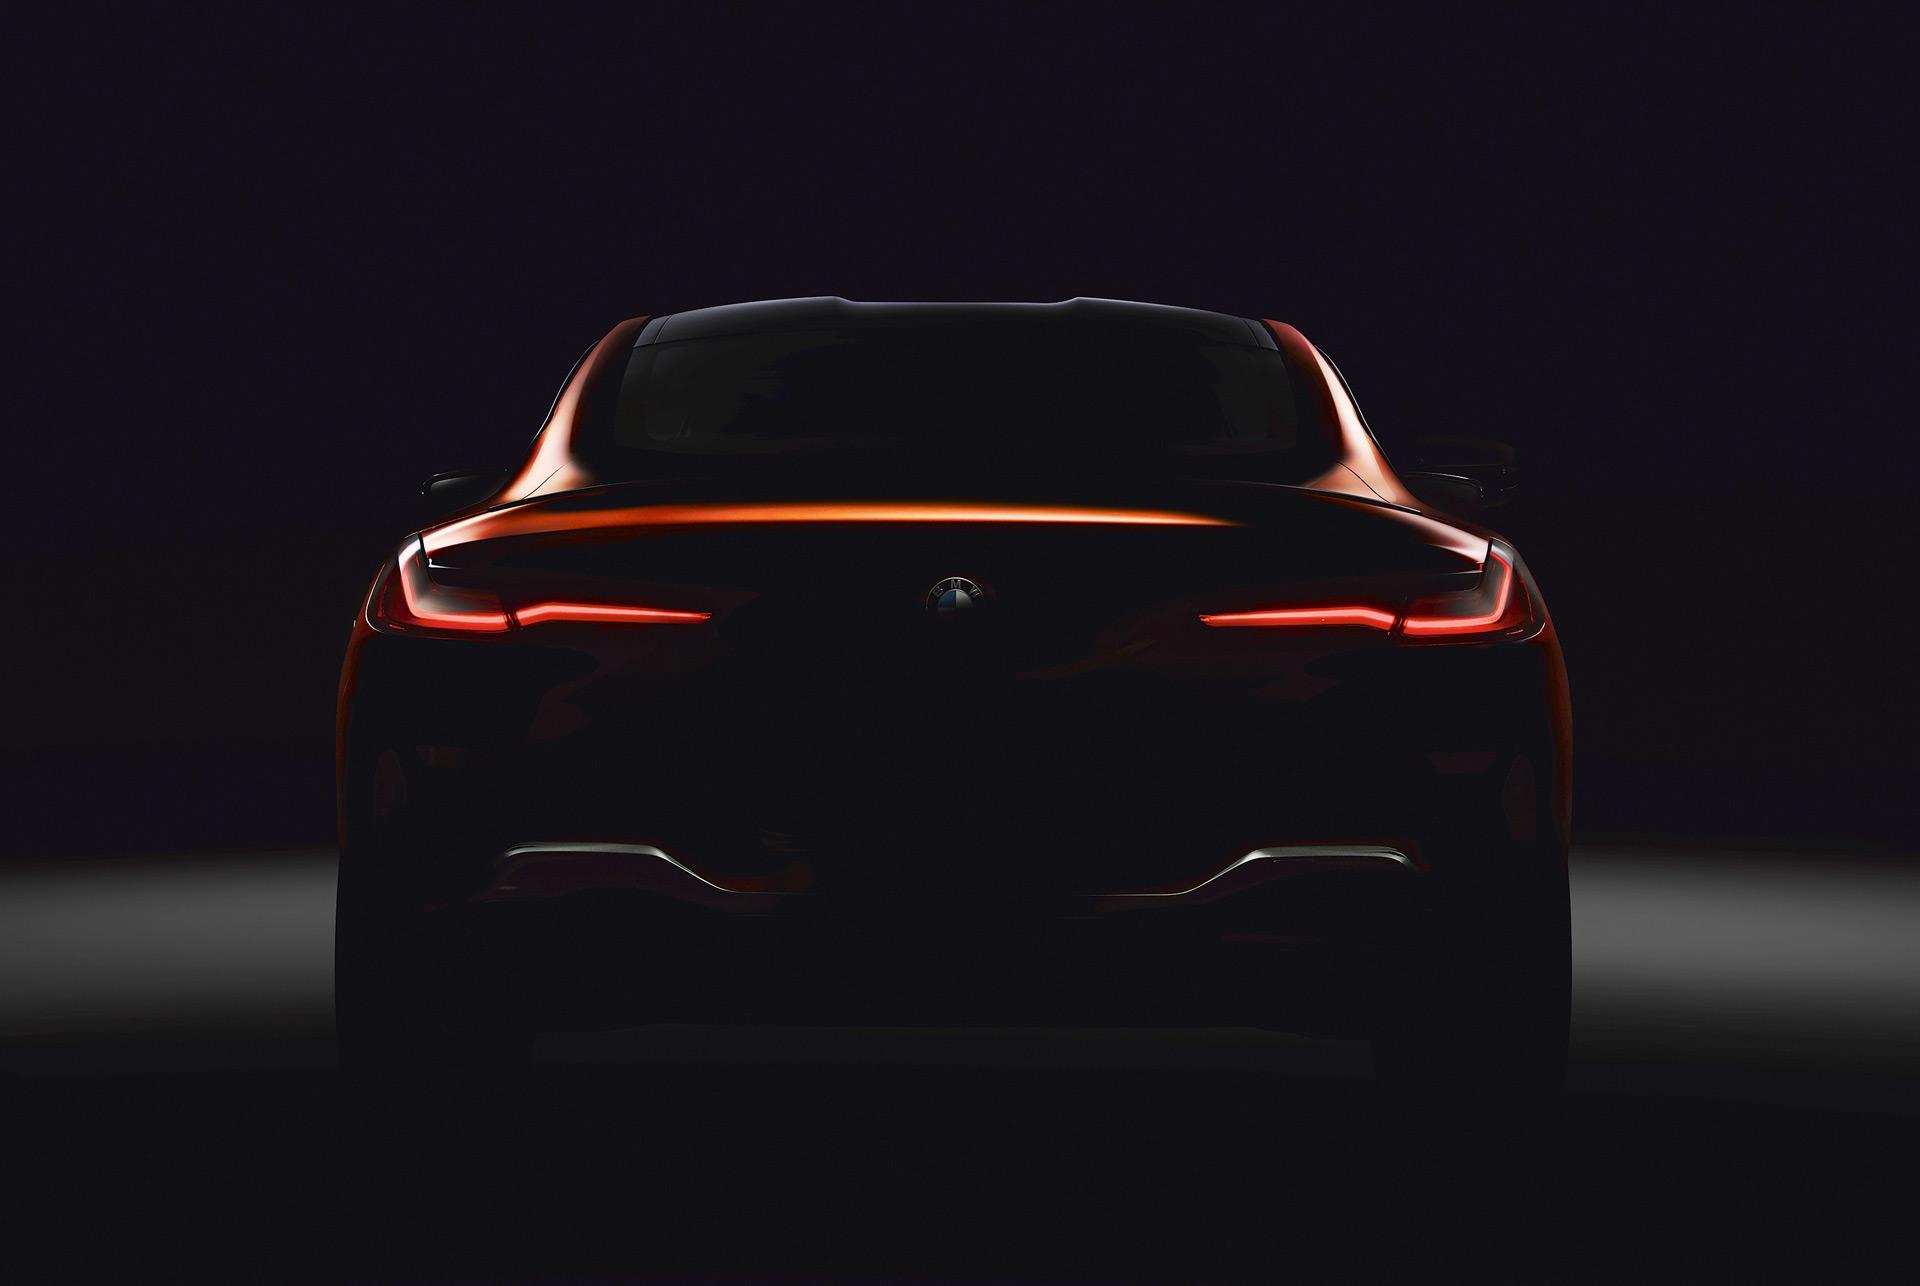 BMW Alquiler venta renting coches de lujo en Palma de Mallorca